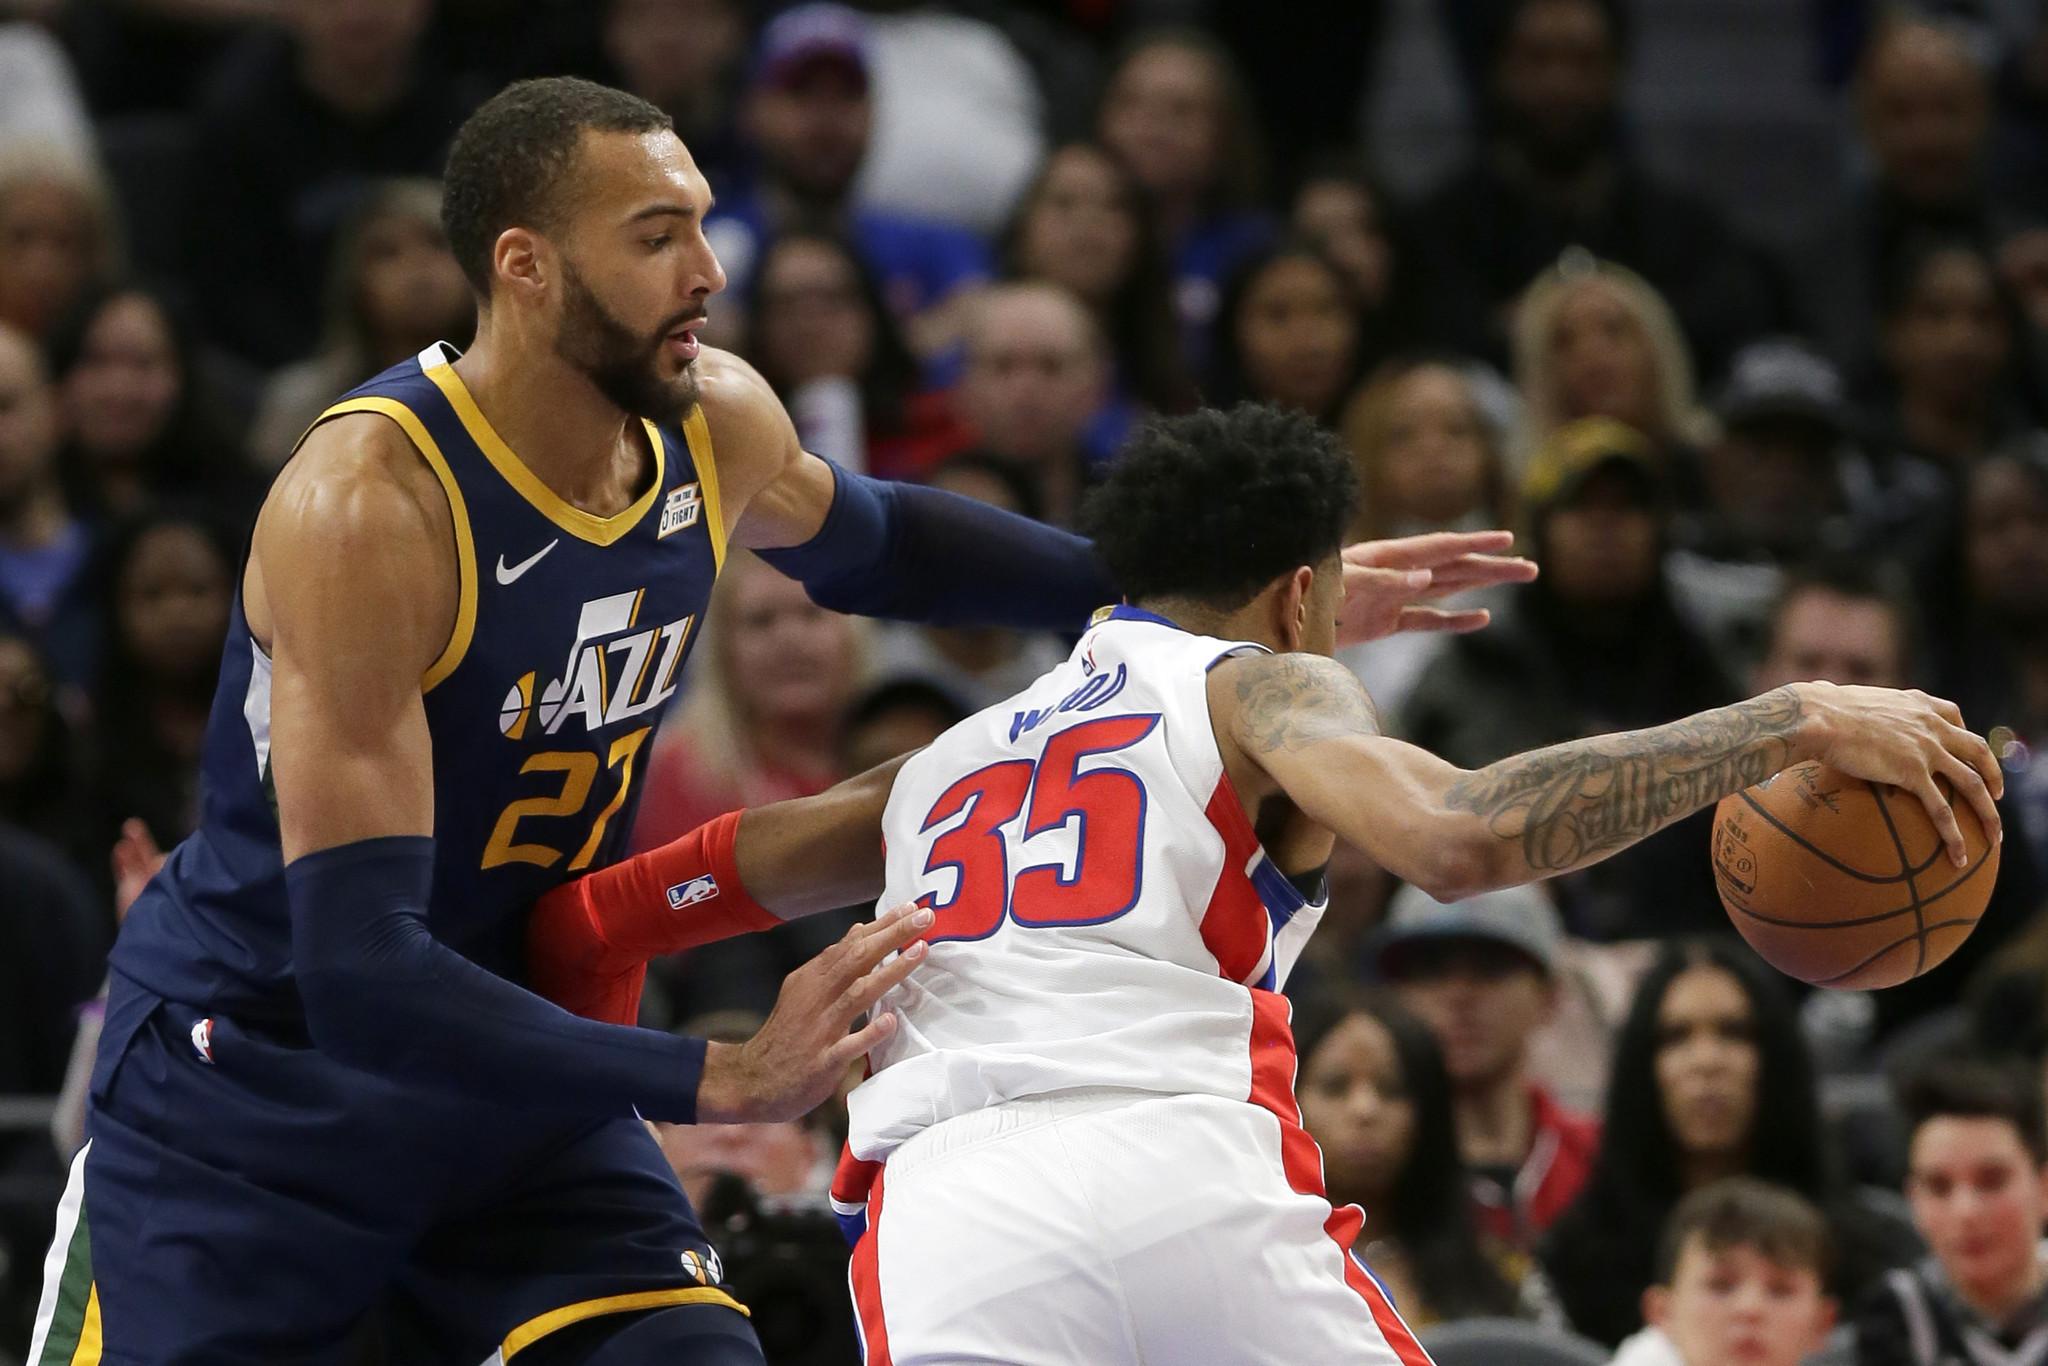 Pistons' Christian Wood has coronavirus, played against Jazz a week ago